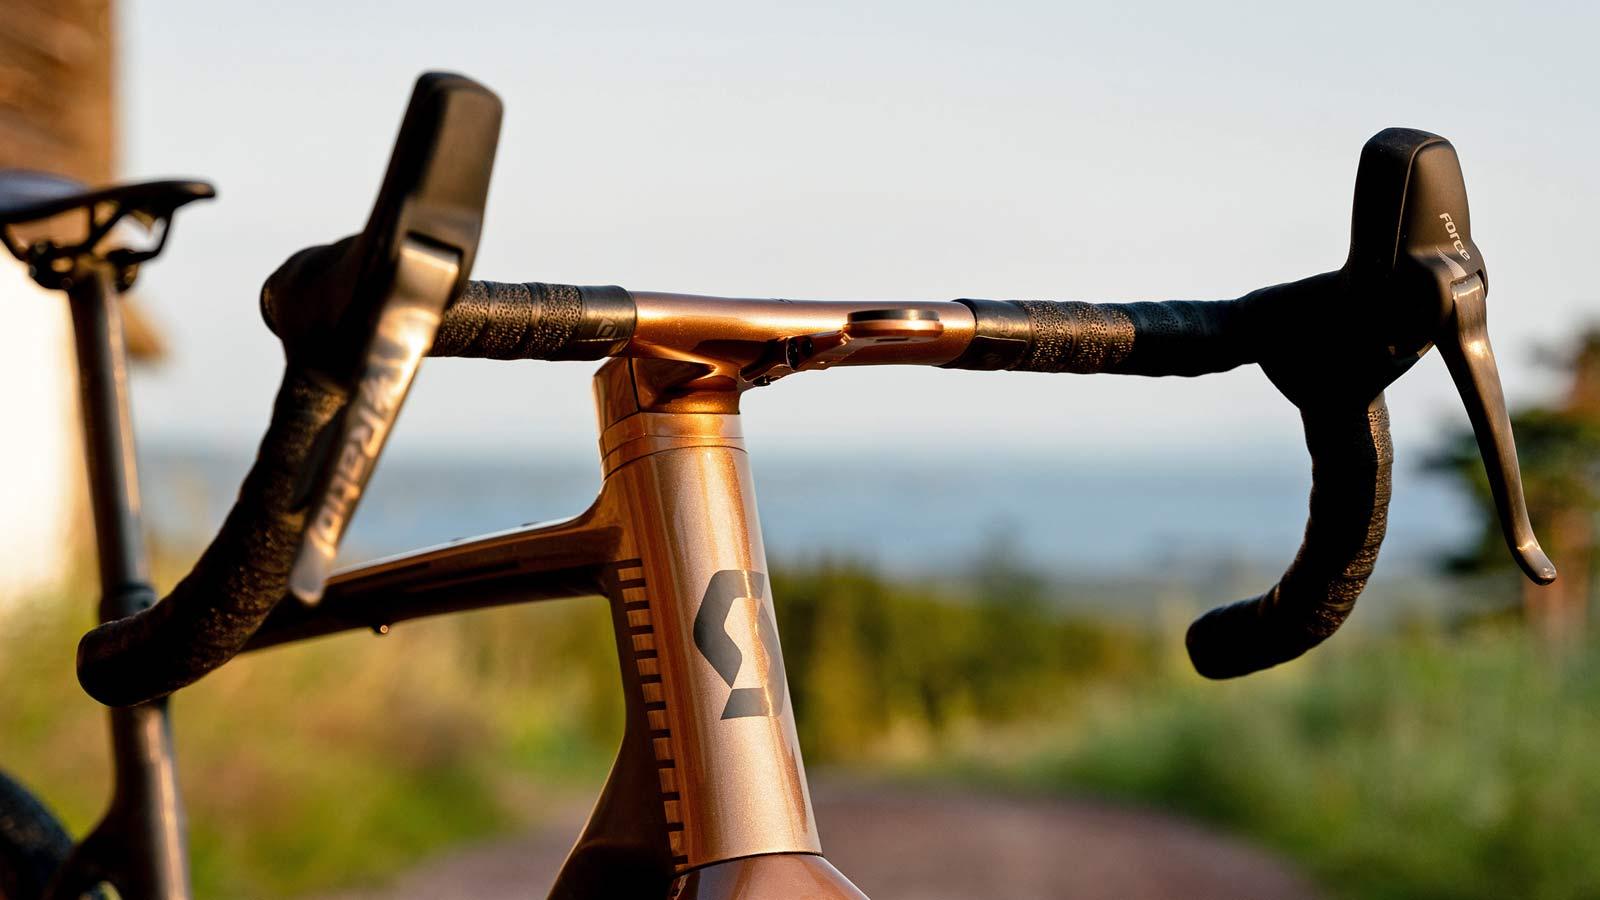 custom Scott Addict Gravel Tuned Dangerholm edition lightweight carbon prototype gravel bike project,Syncros cockpit